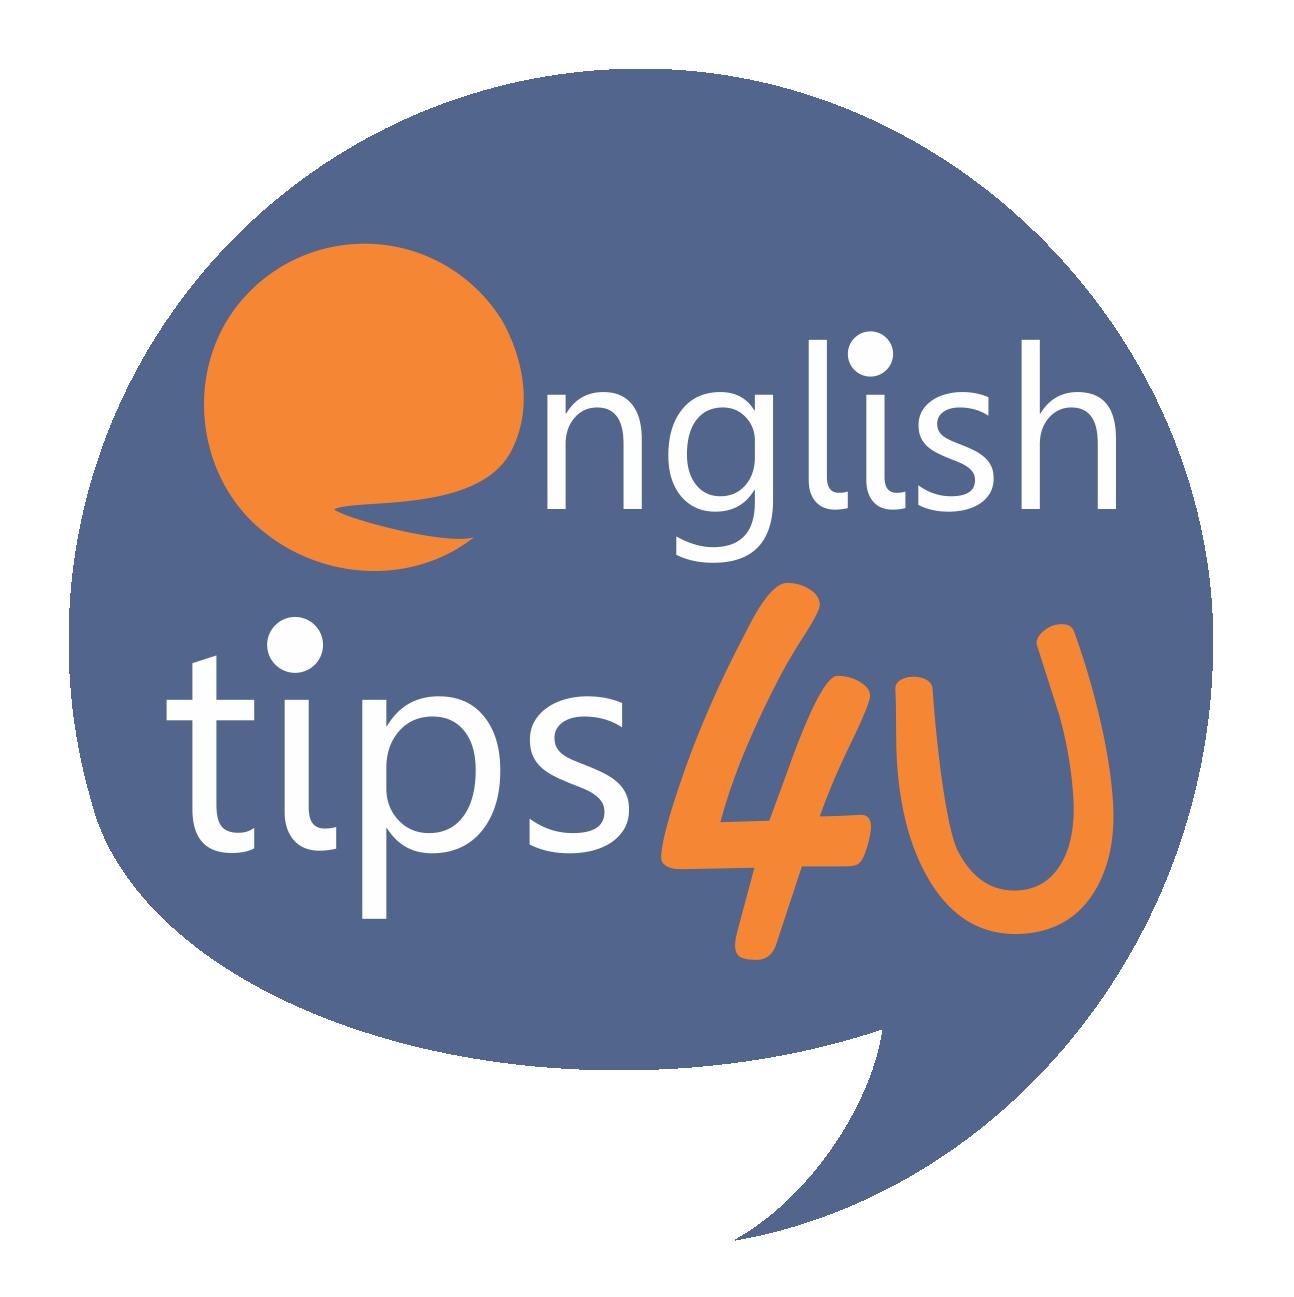 3 Ways to Study the English Language - wikiHow